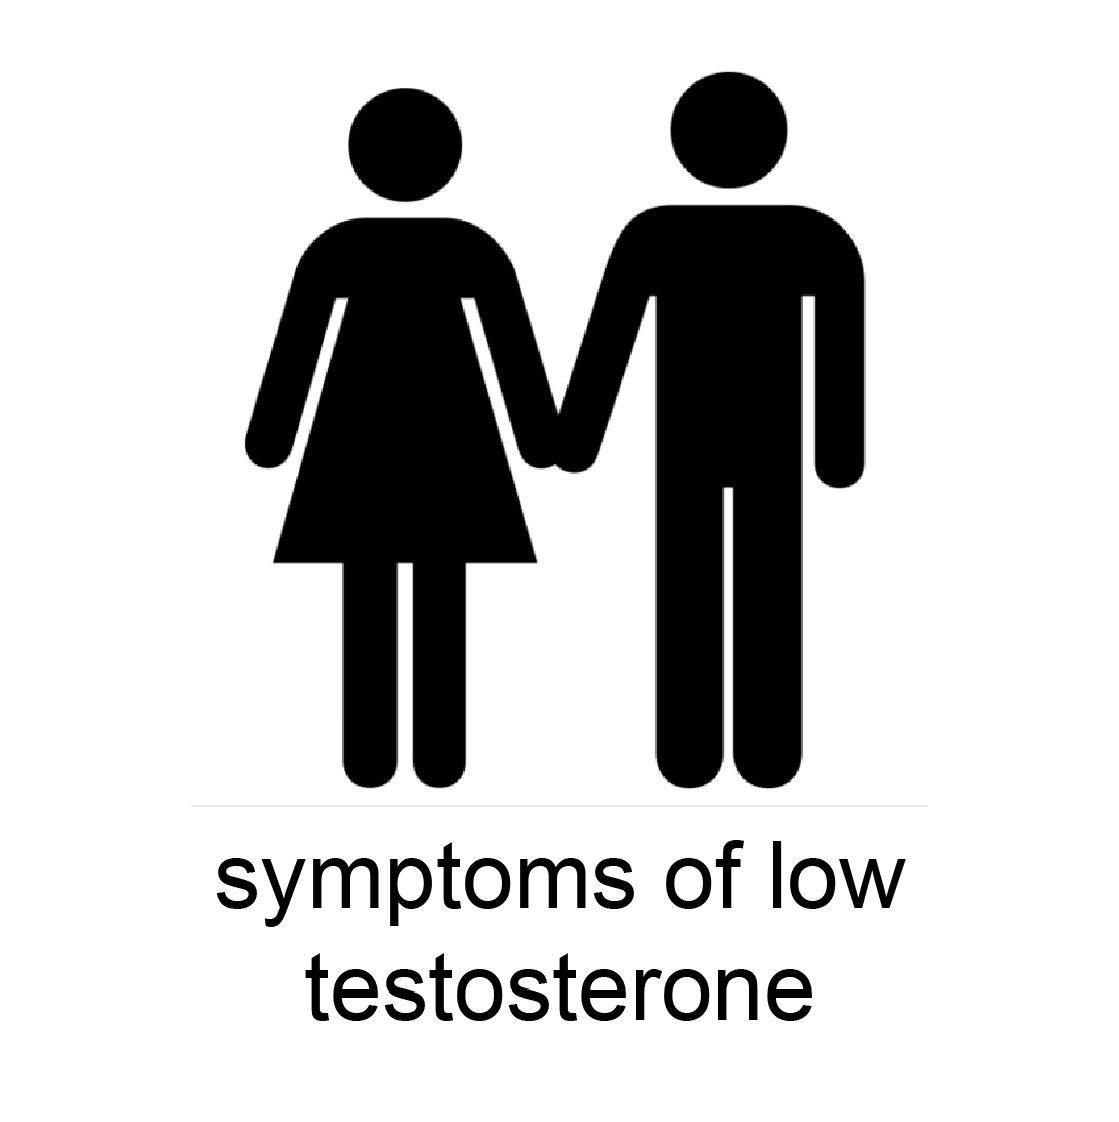 Symptoms of Low Testosterone